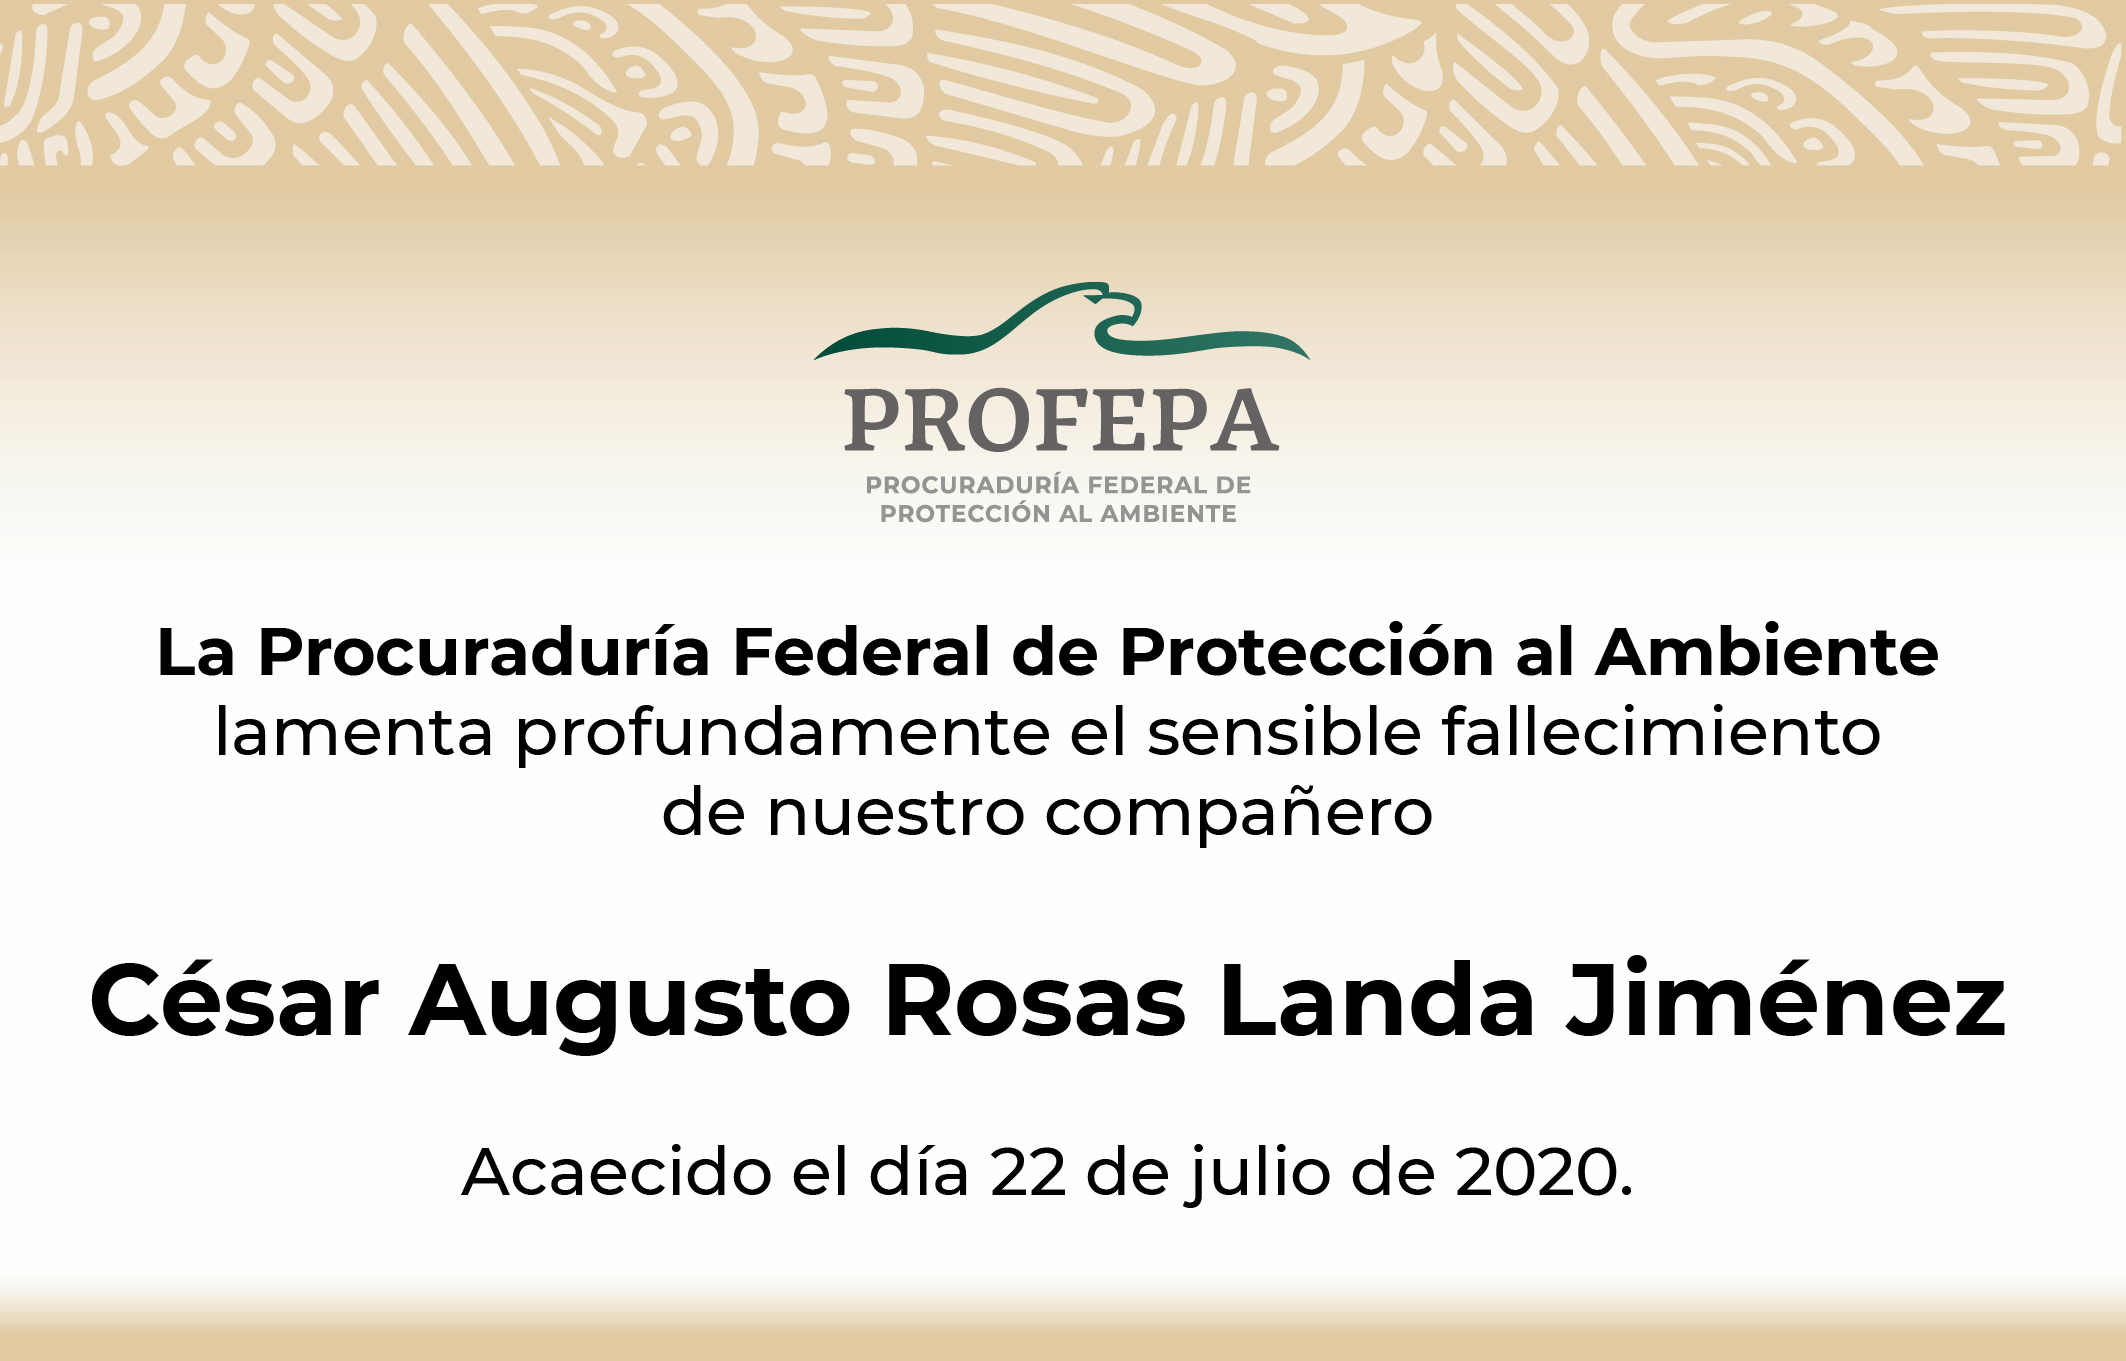 En memoria de César Augusto Rosas Landa Jiménez